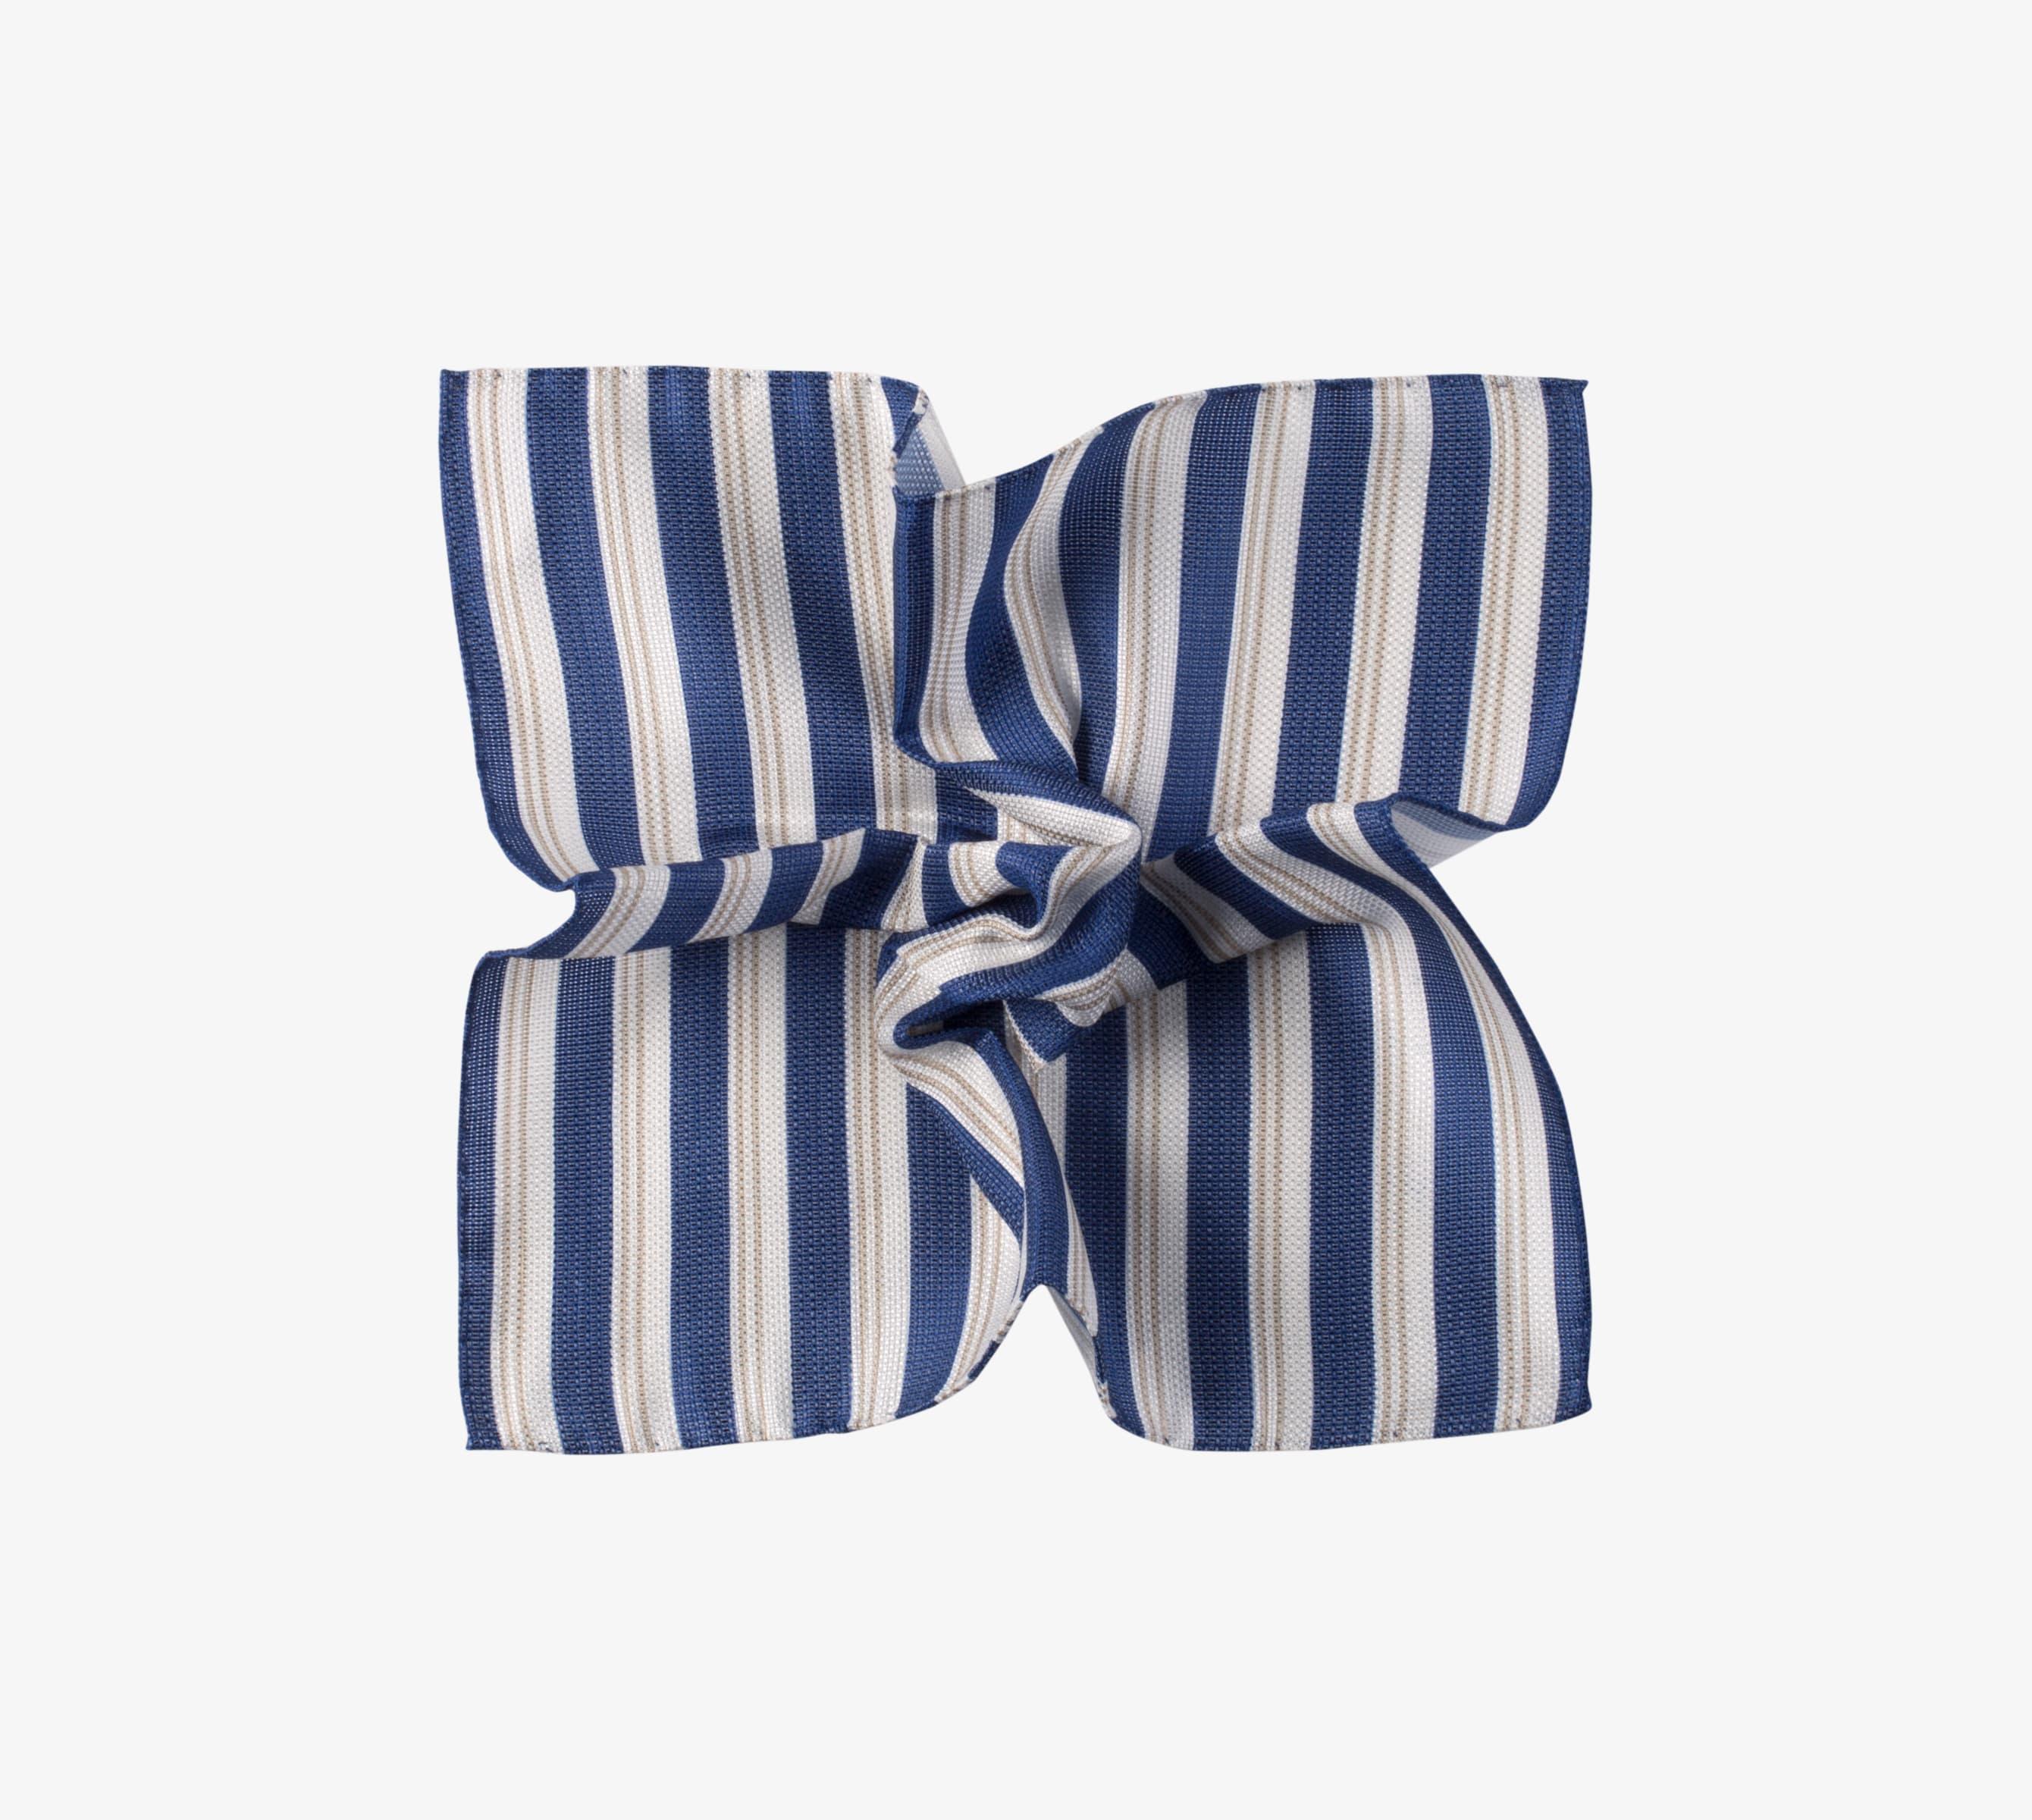 Blue_Pocket_Square_PS18113